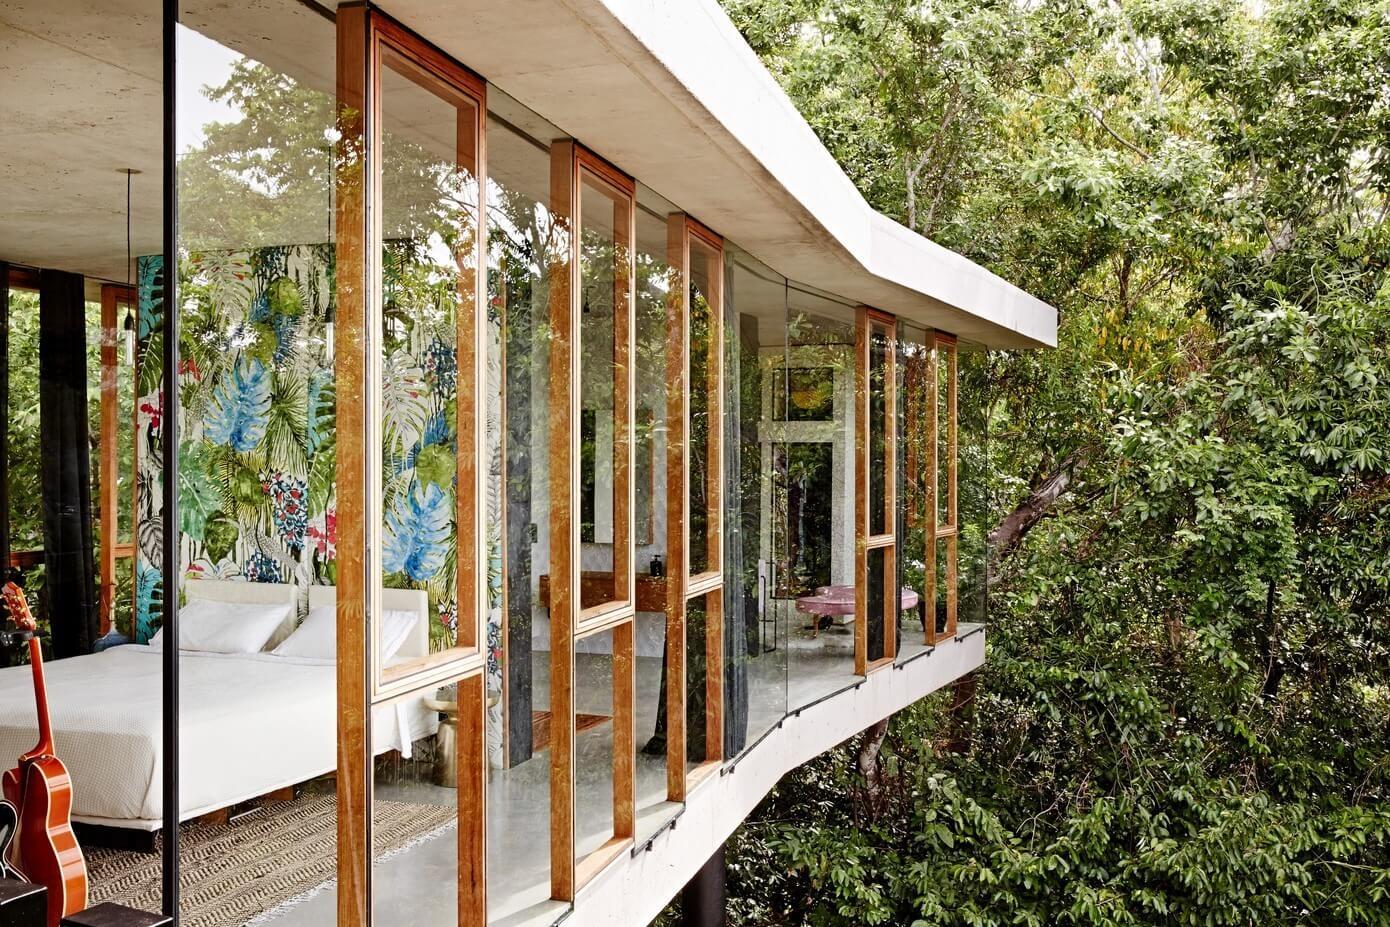 planchonella-house-jesse-bennett-architect-21